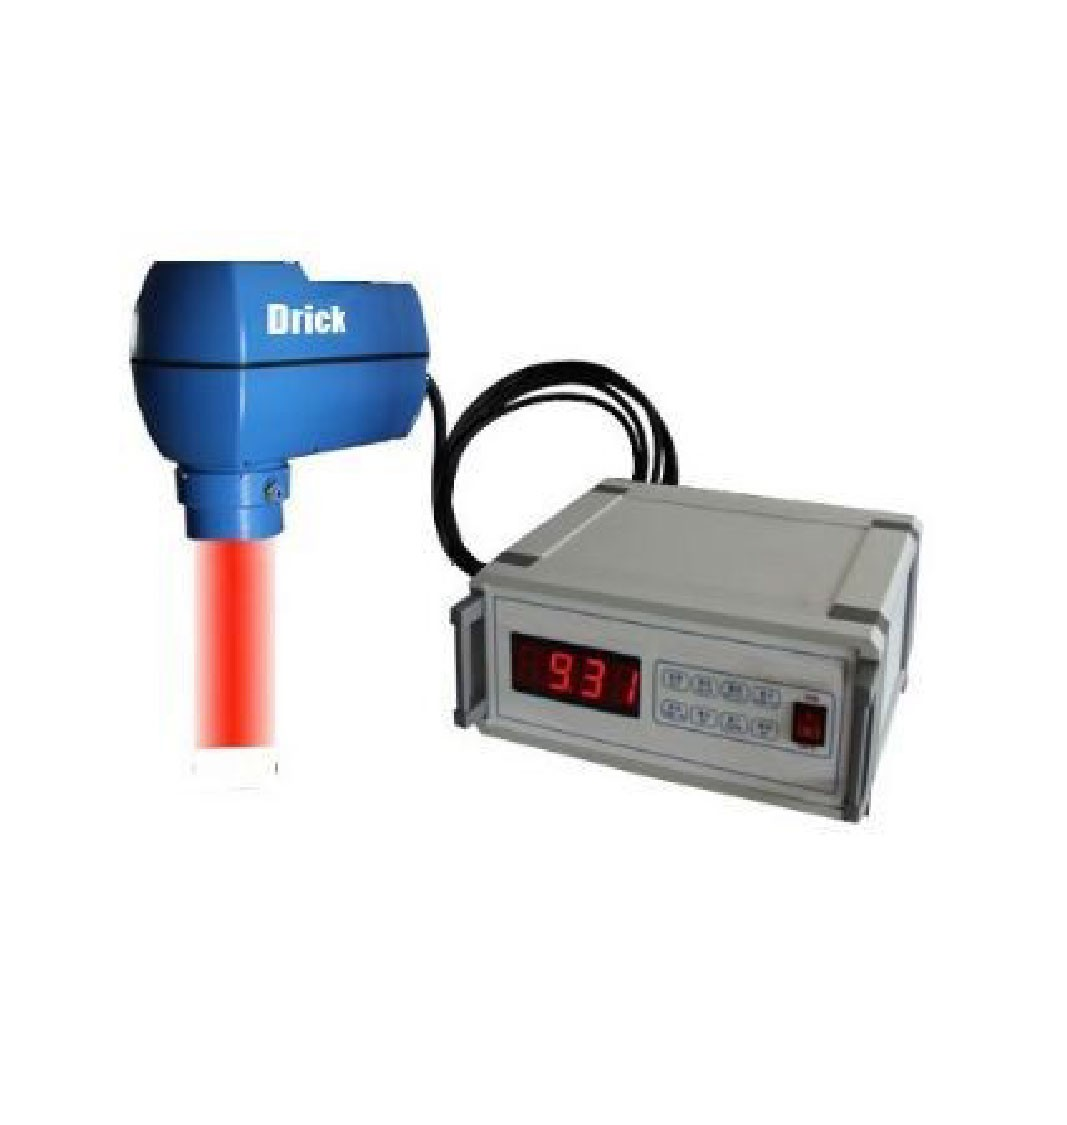 Near infrared online moisture meter